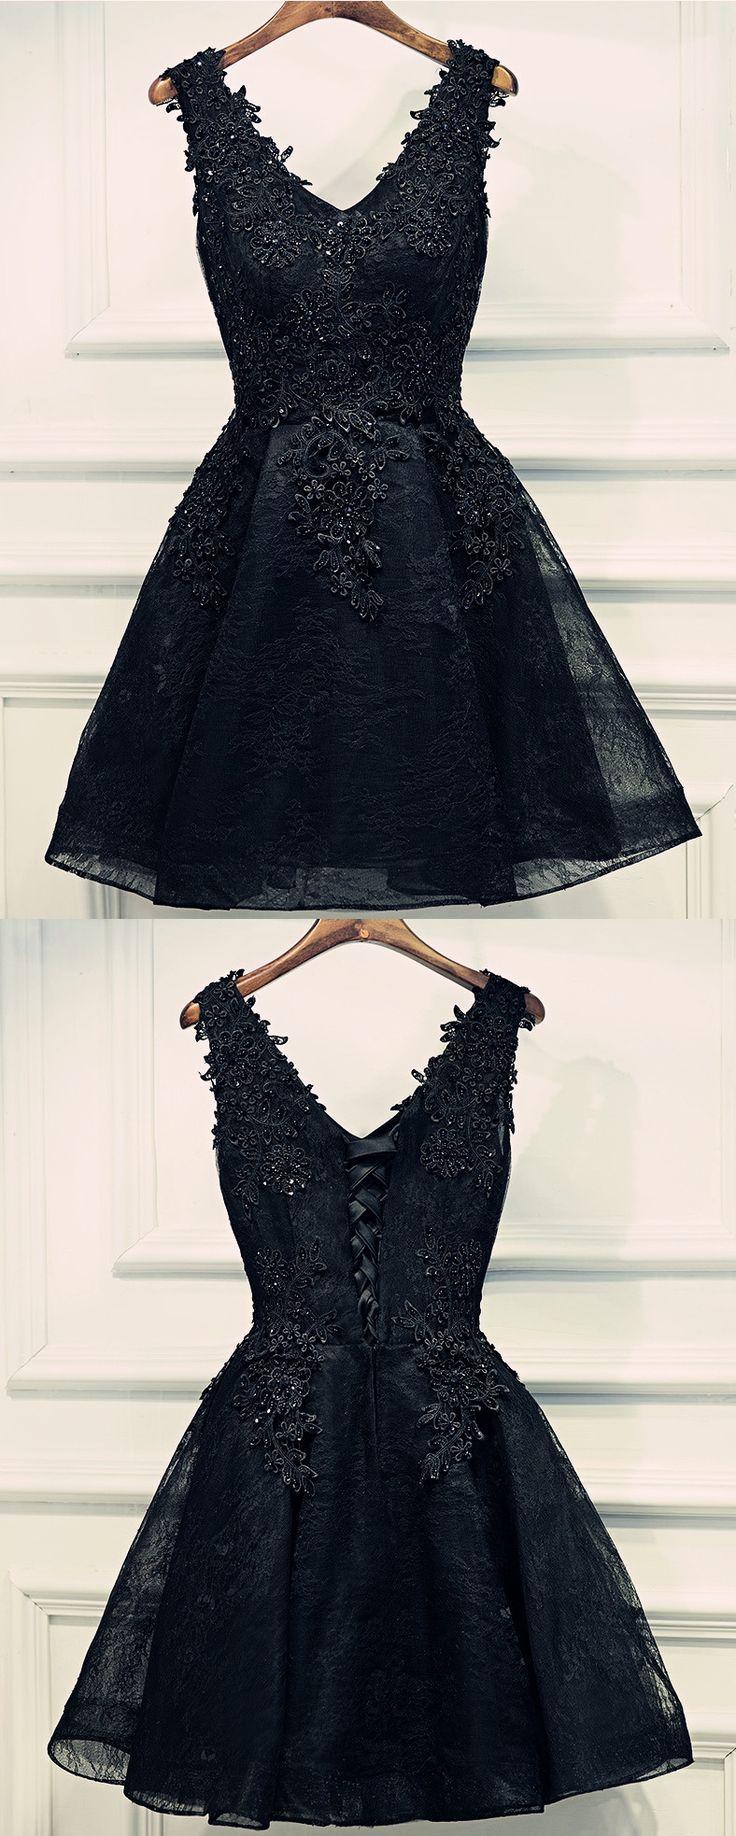 Black lace black dress